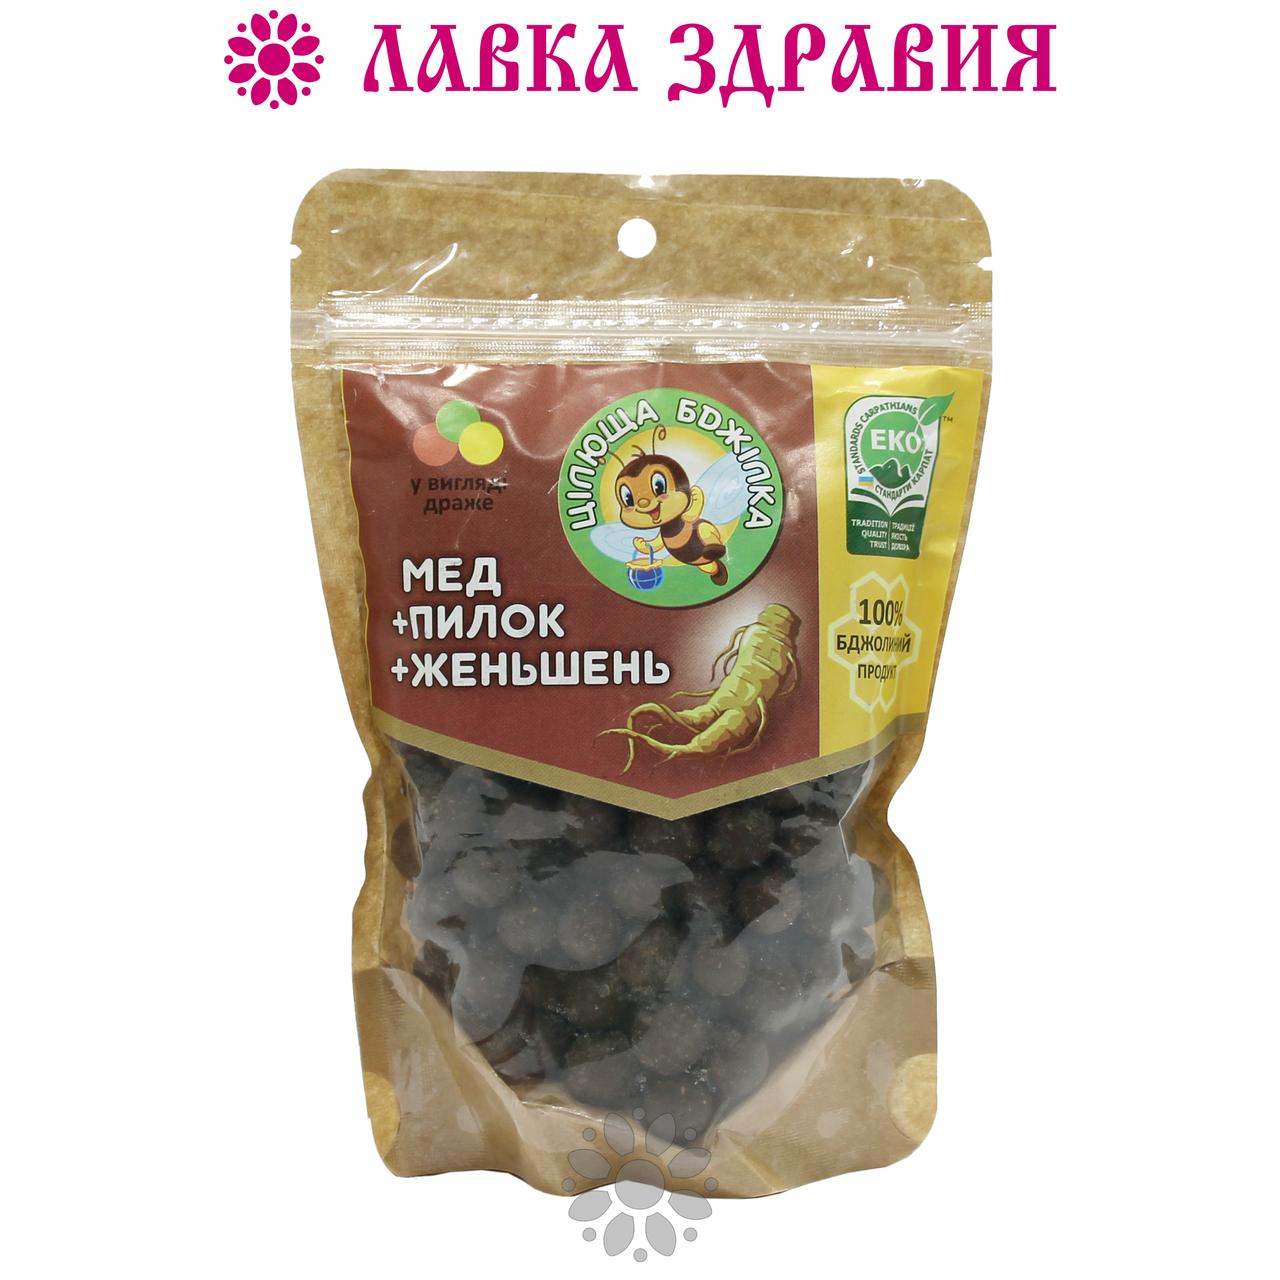 "Натуральные конфеты-драже ""Цілюща бджілка"" с женьшенем, 150 г"